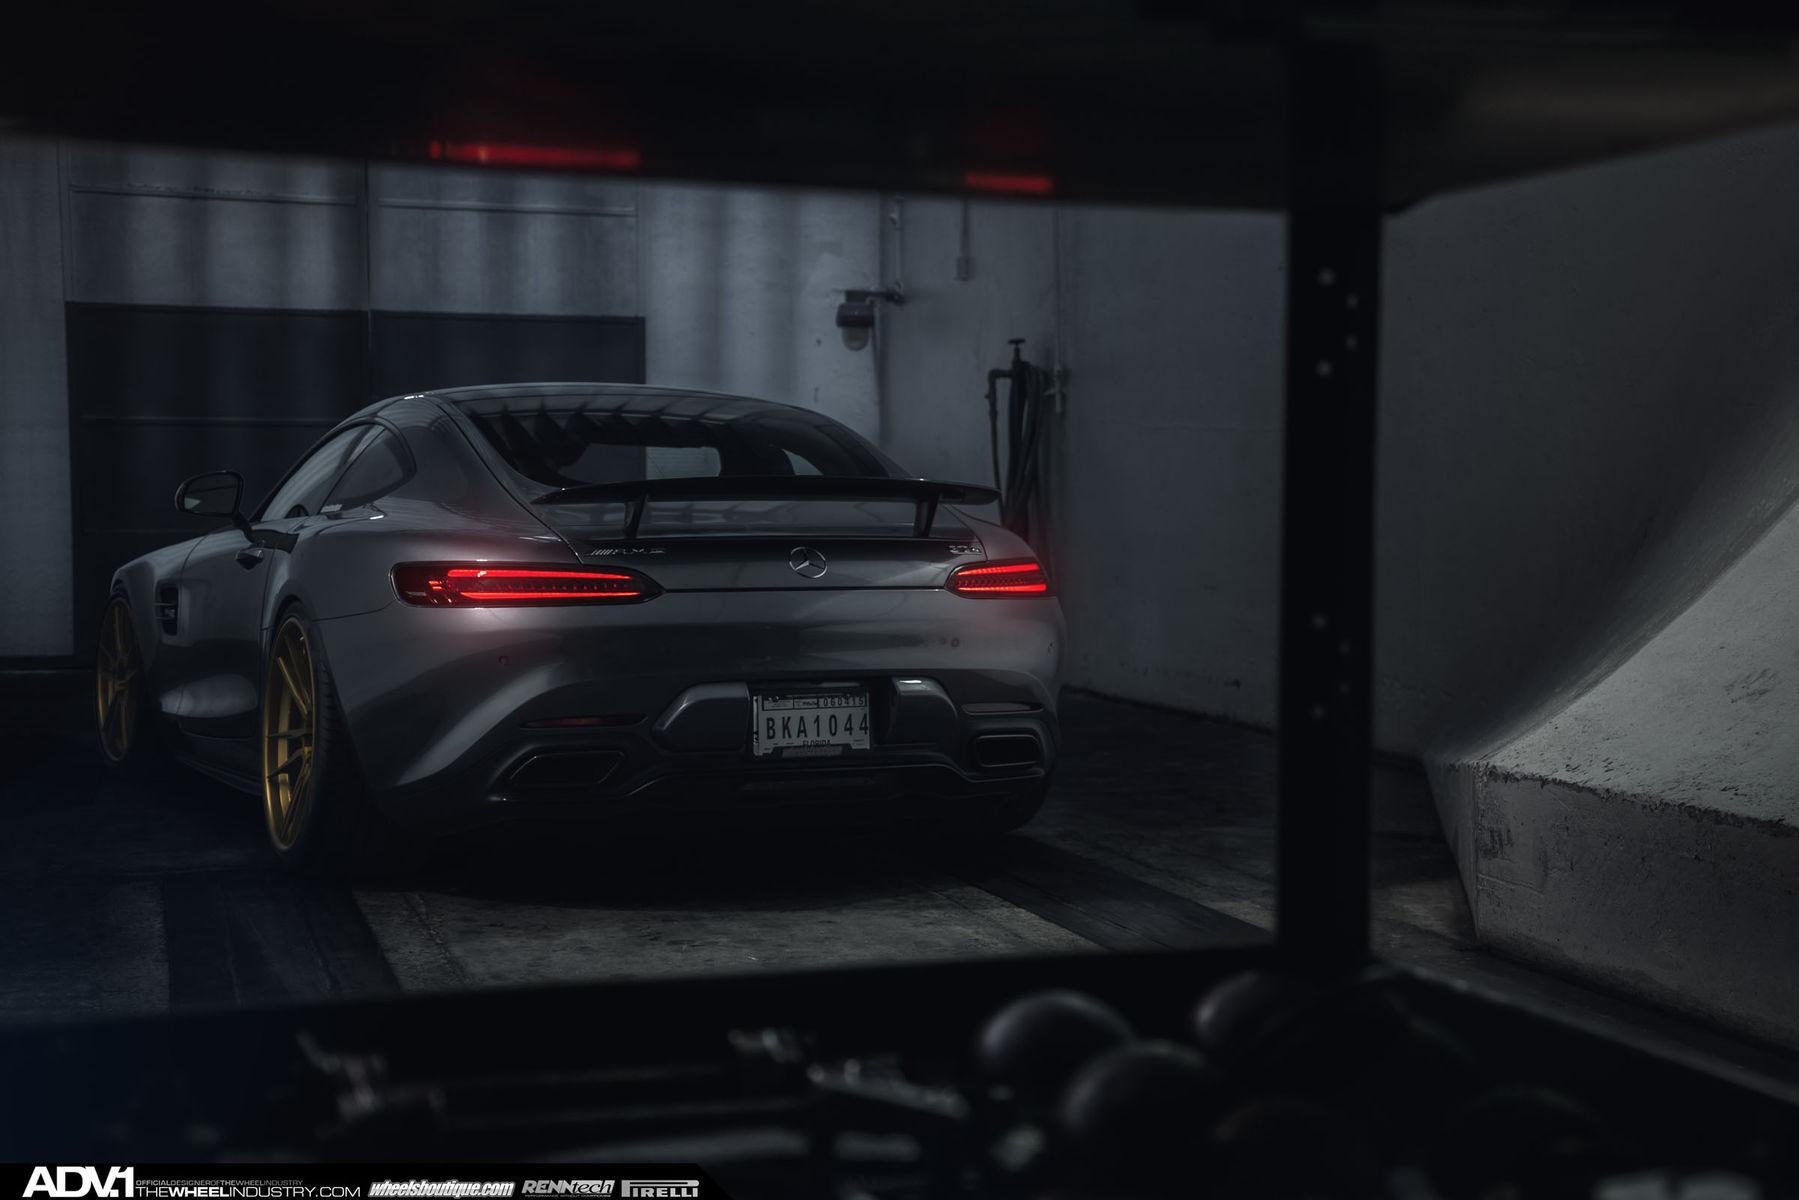 2016 Mercedes-Benz  | ADV1 Mercedes AMG GT-S Edition 1